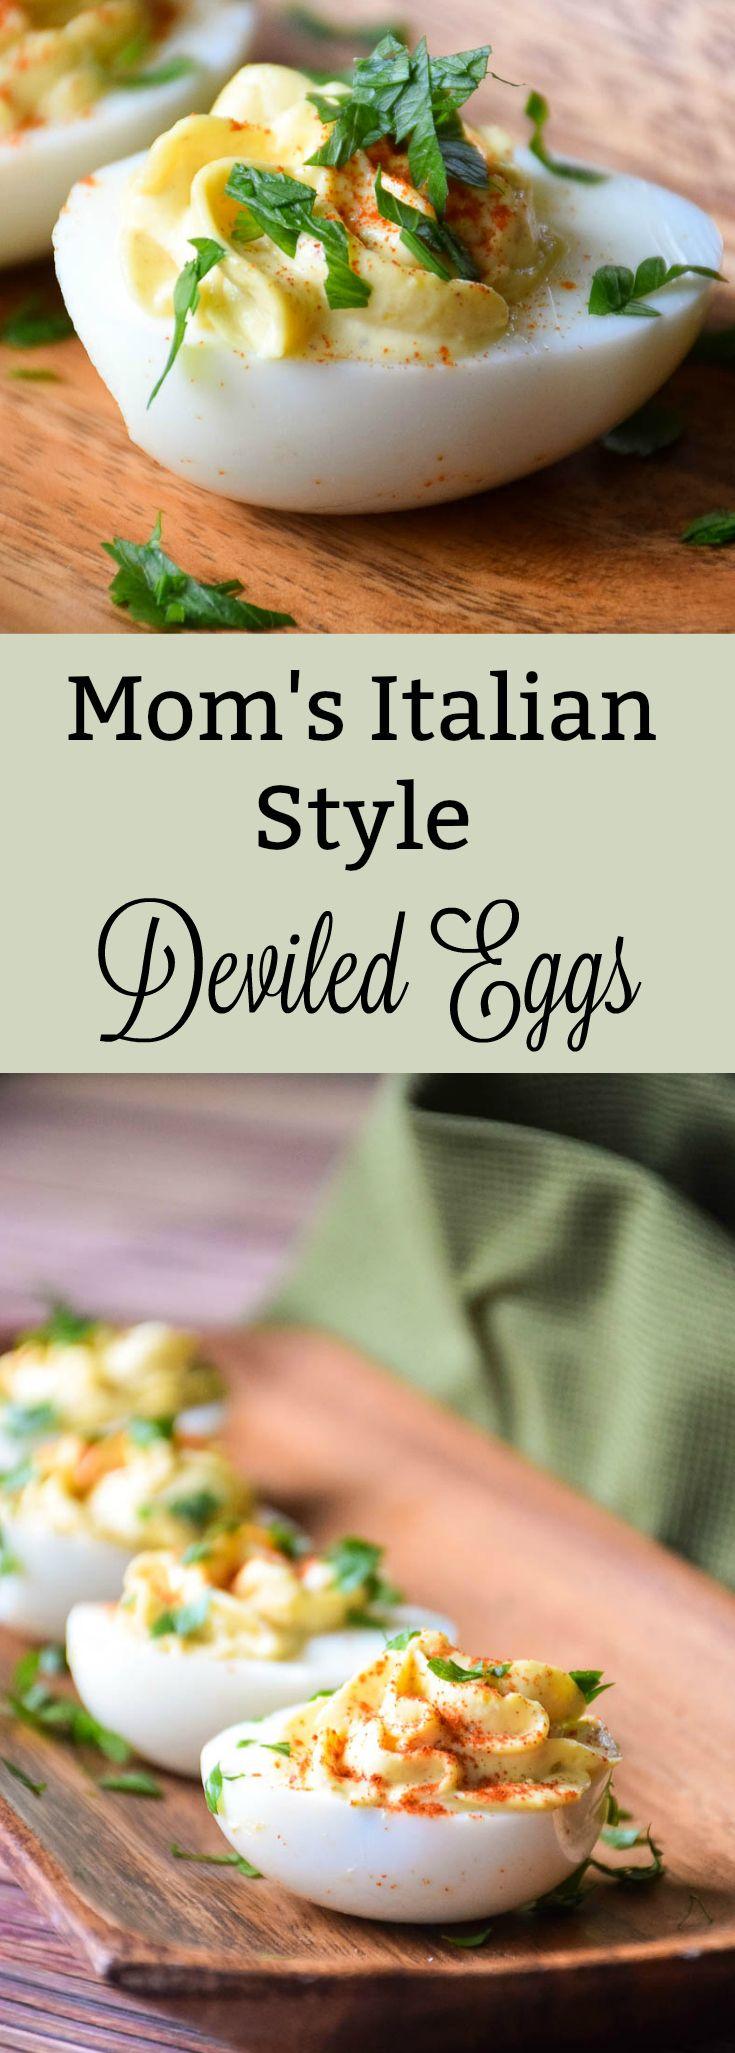 Mom's Italian Style Deviled Eggs - Grumpy's Honeybunch #deviledeggs